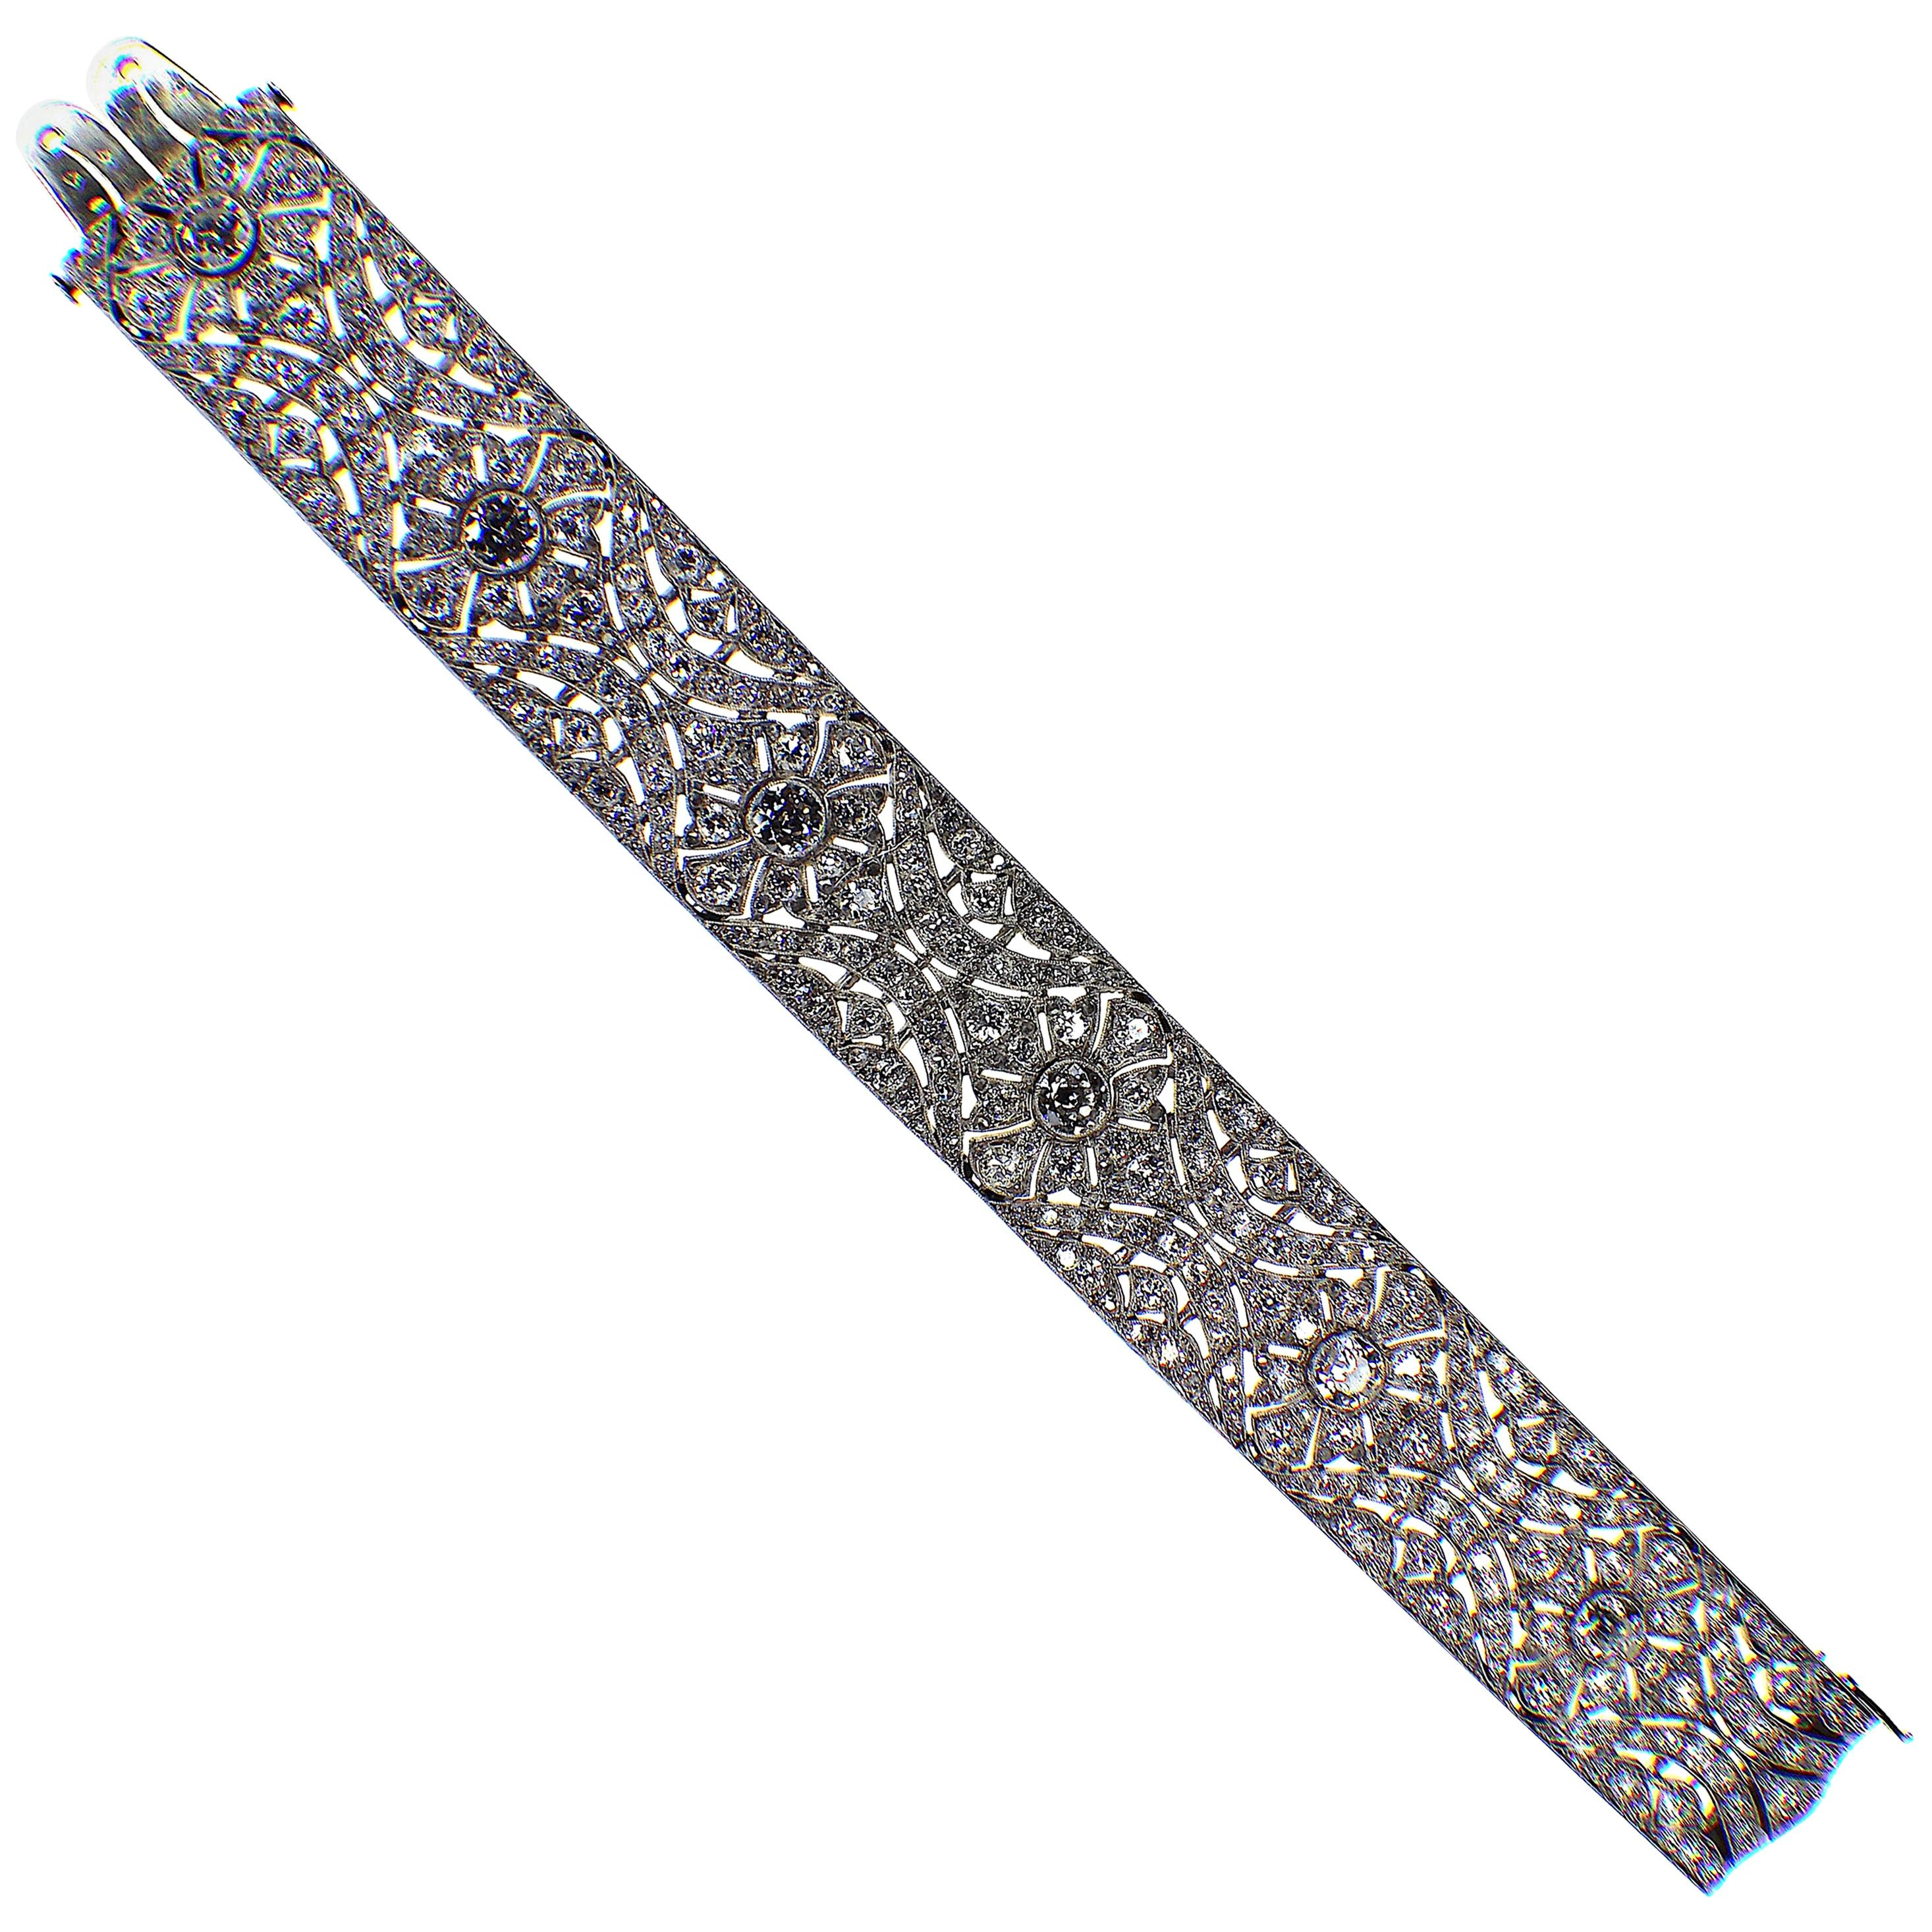 Gemolithos French 1920s Art Deco Platinum Diamond Bracelet